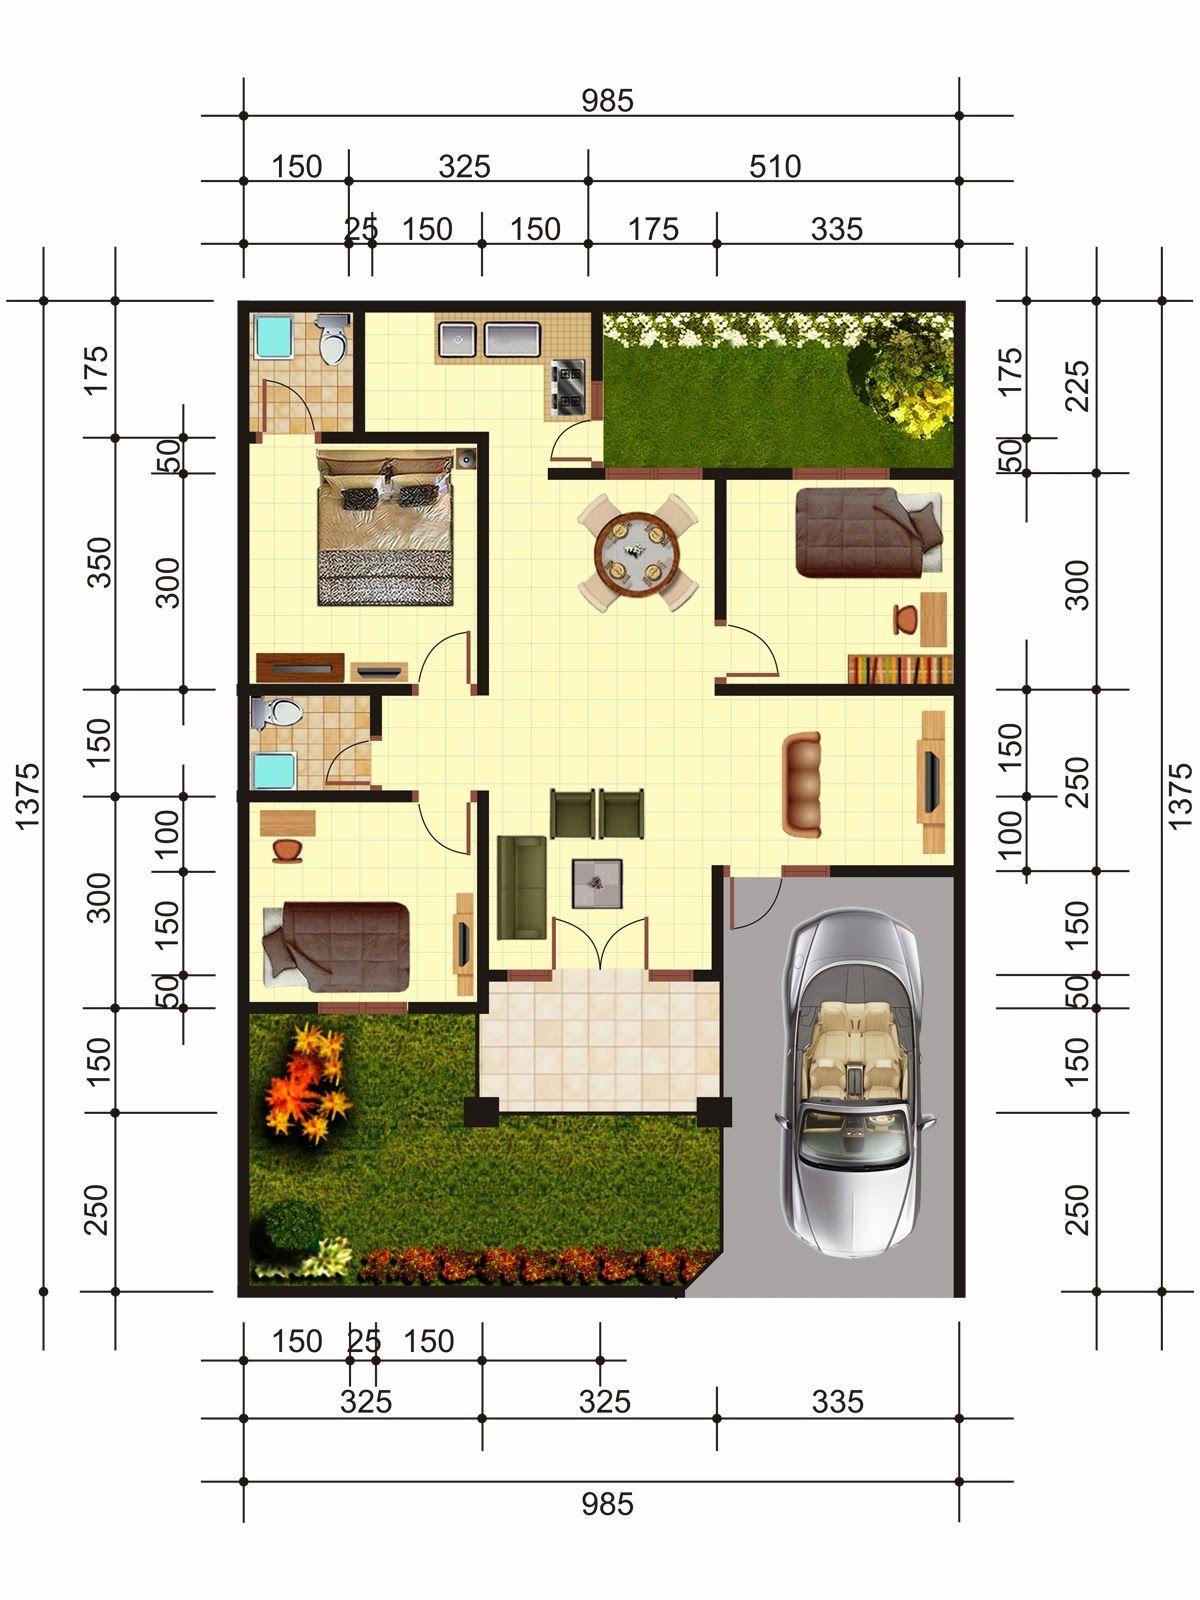 Denah Rumah Minimalis Terbaru Gambar Sederhana Rumah Idaman